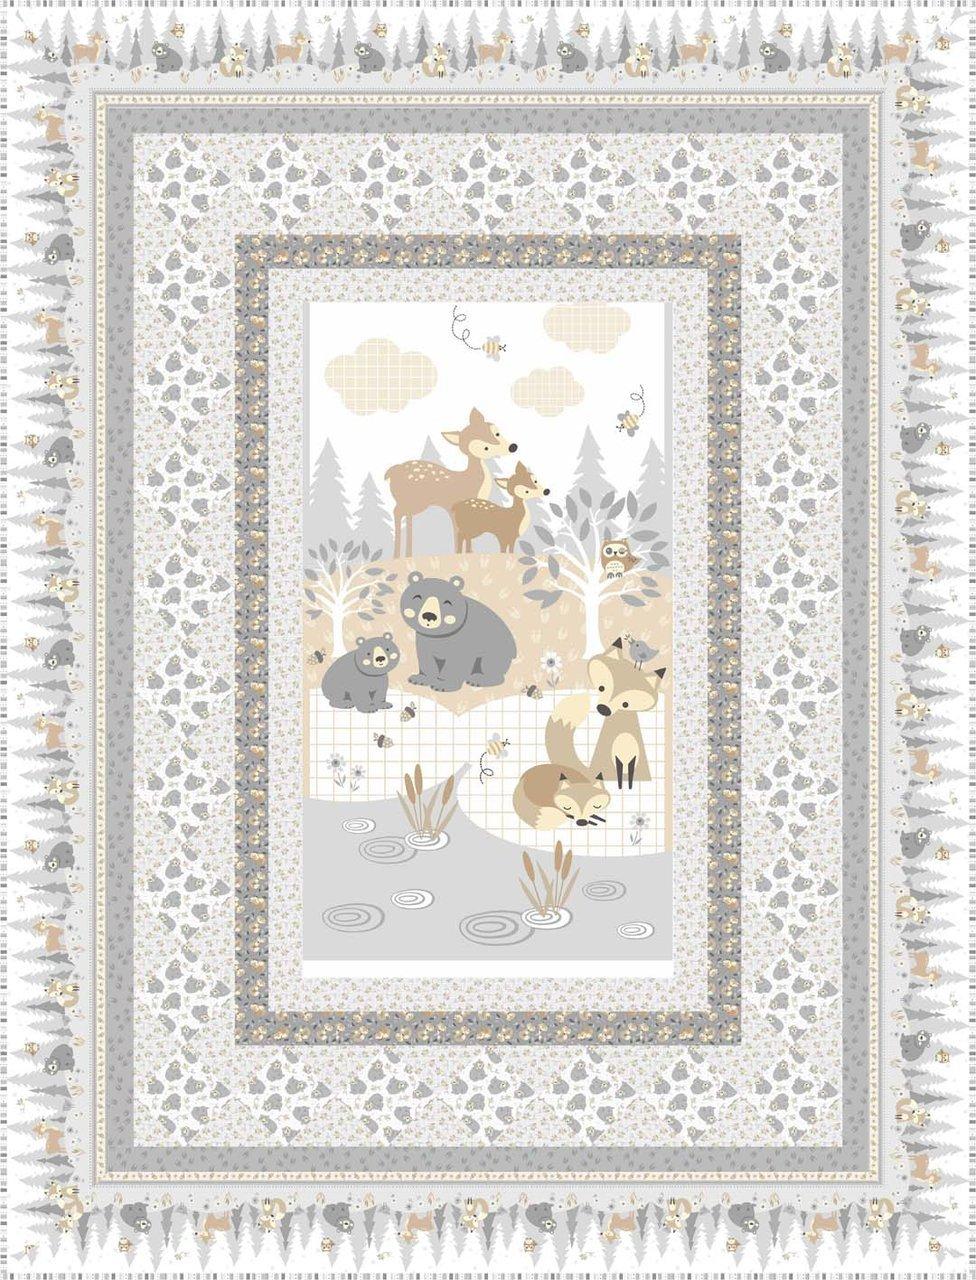 Little Critters Panel Quilt Kit